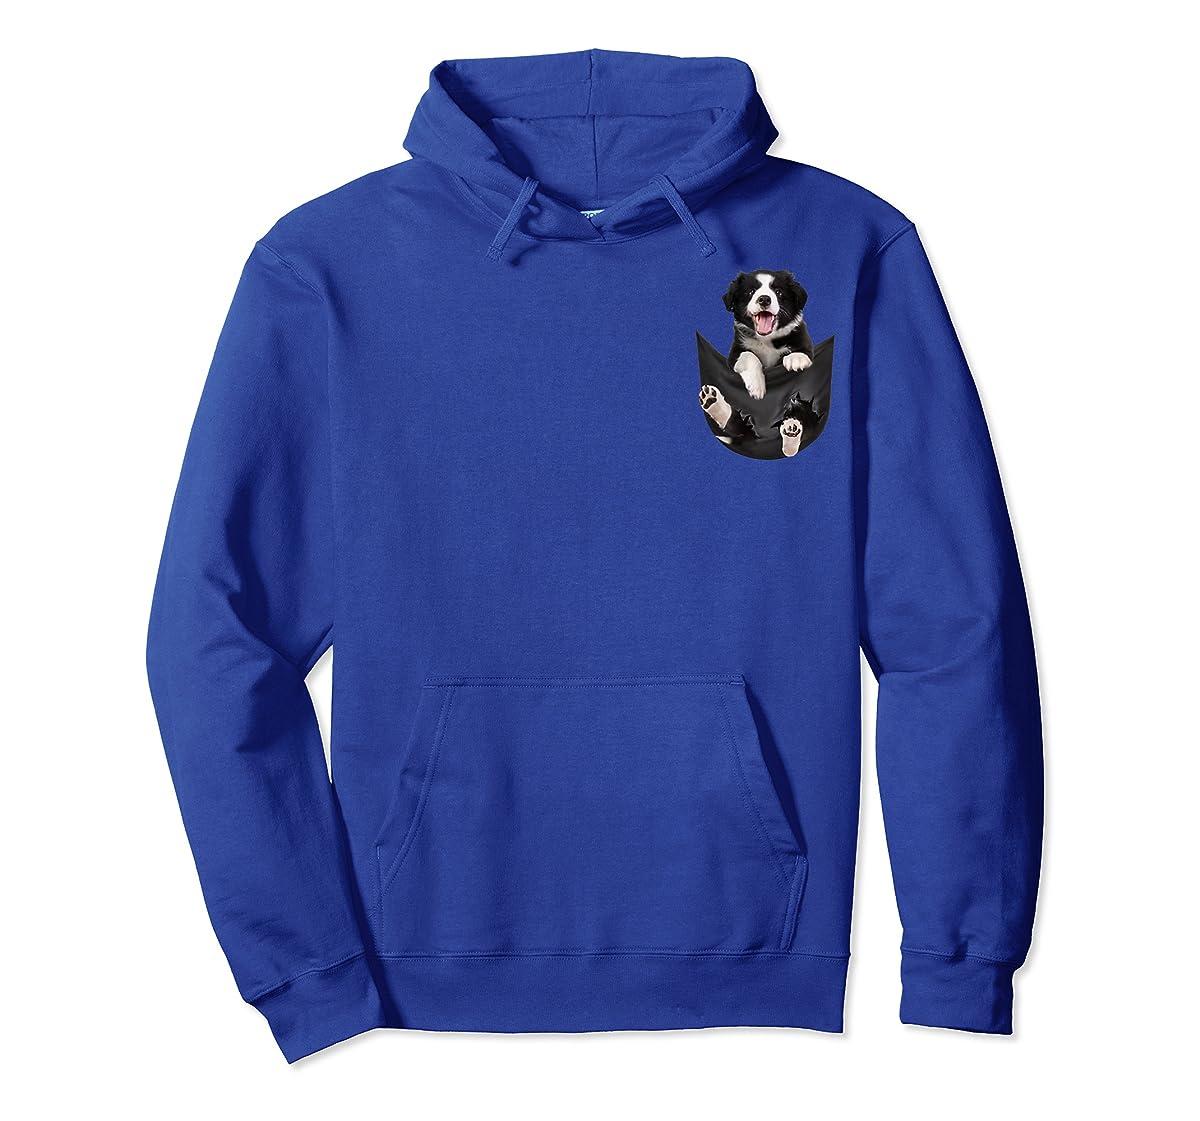 Gift dog funny cute shirt - Border Collie in pocket shirt T-Shirt-Hoodie-Royal